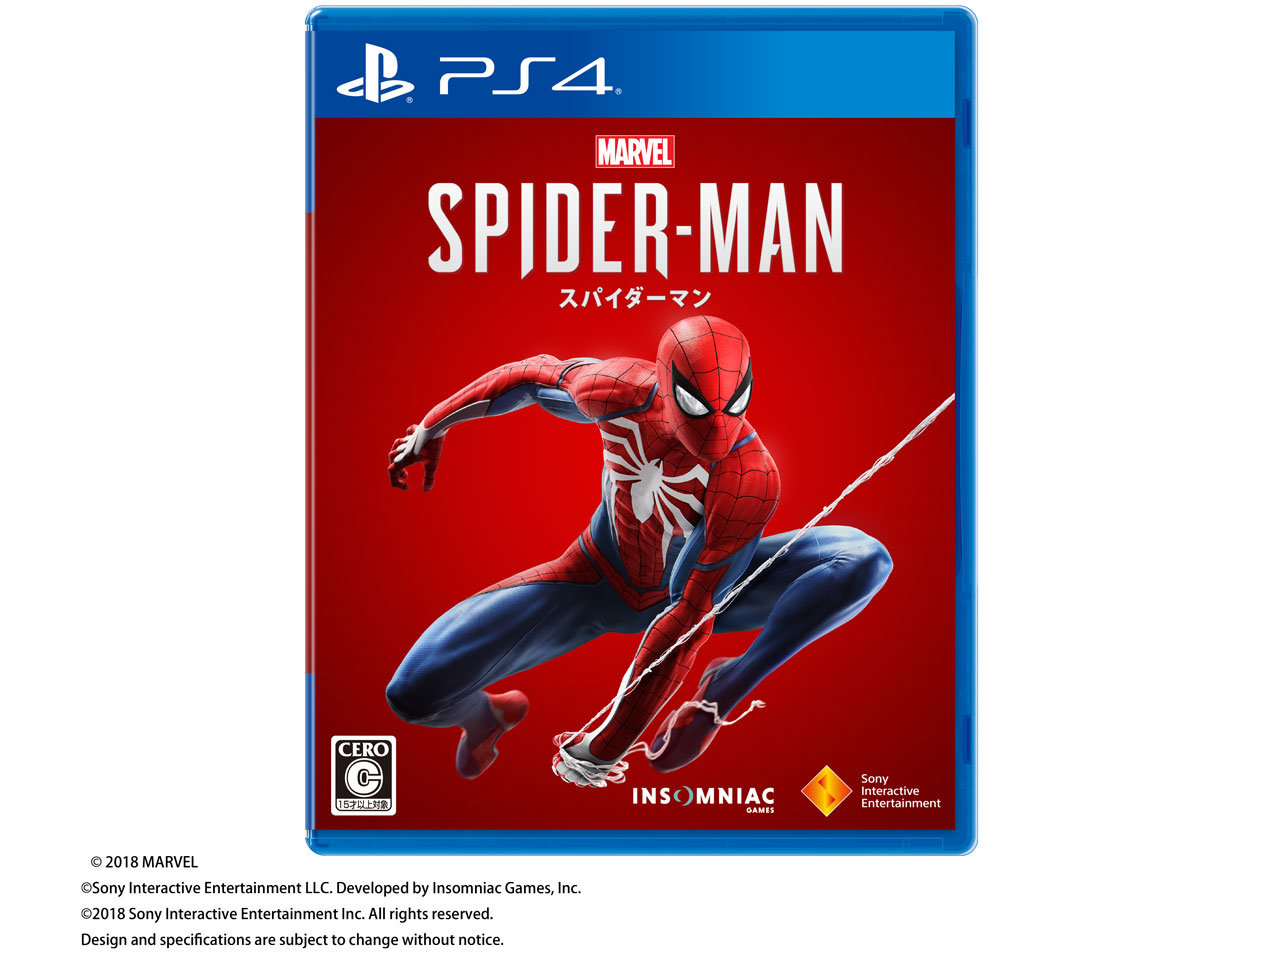 Marvel's Spider-Man [PS4] の製品画像